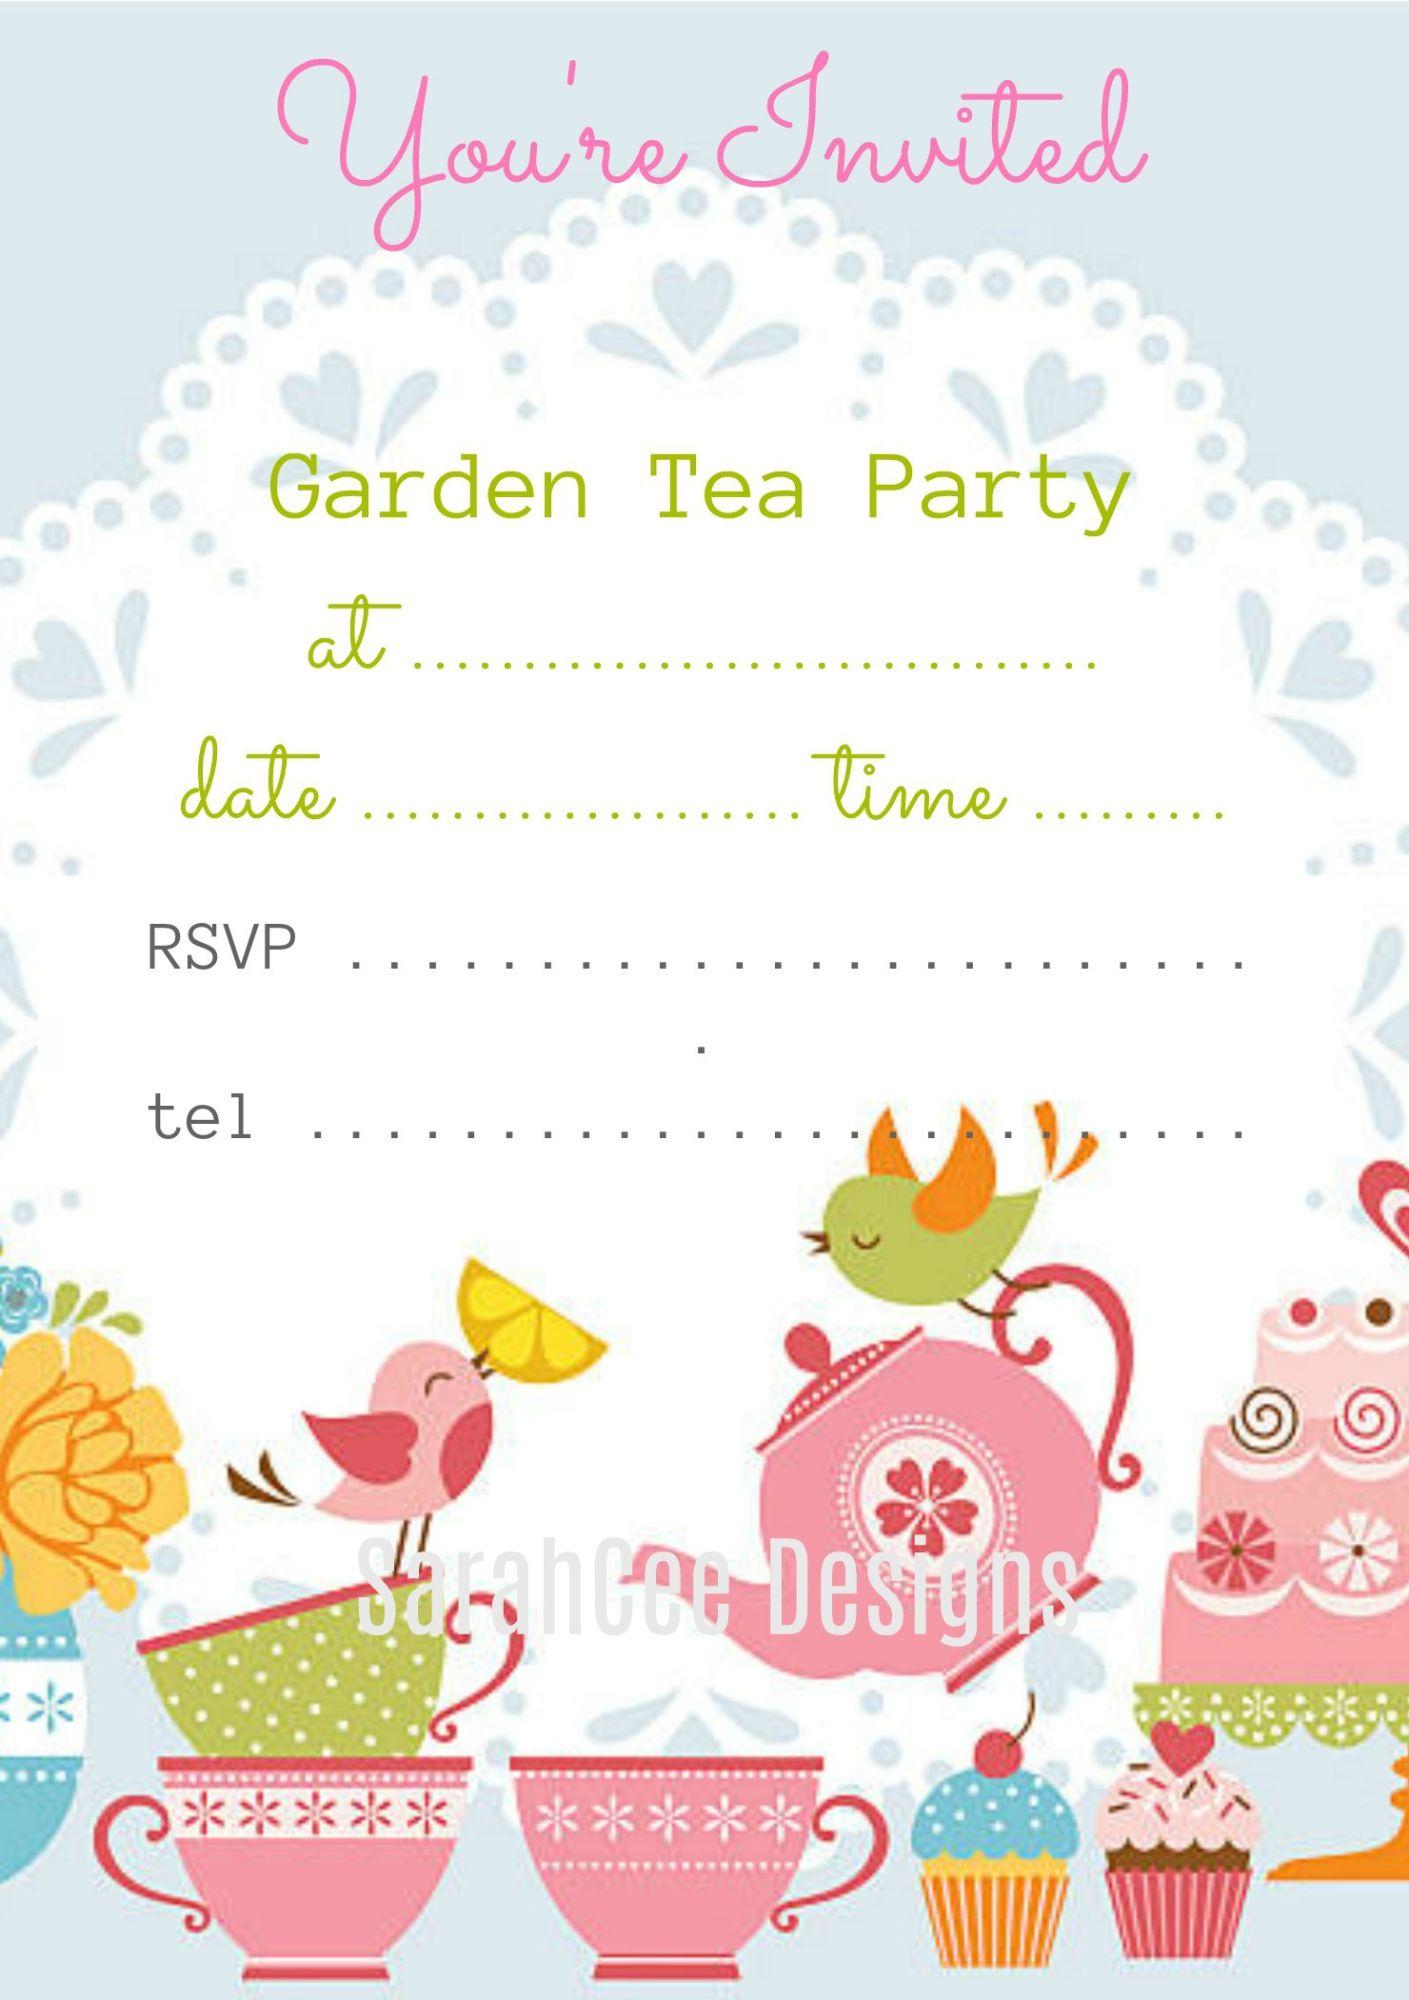 Garden & Tea Party Invitations